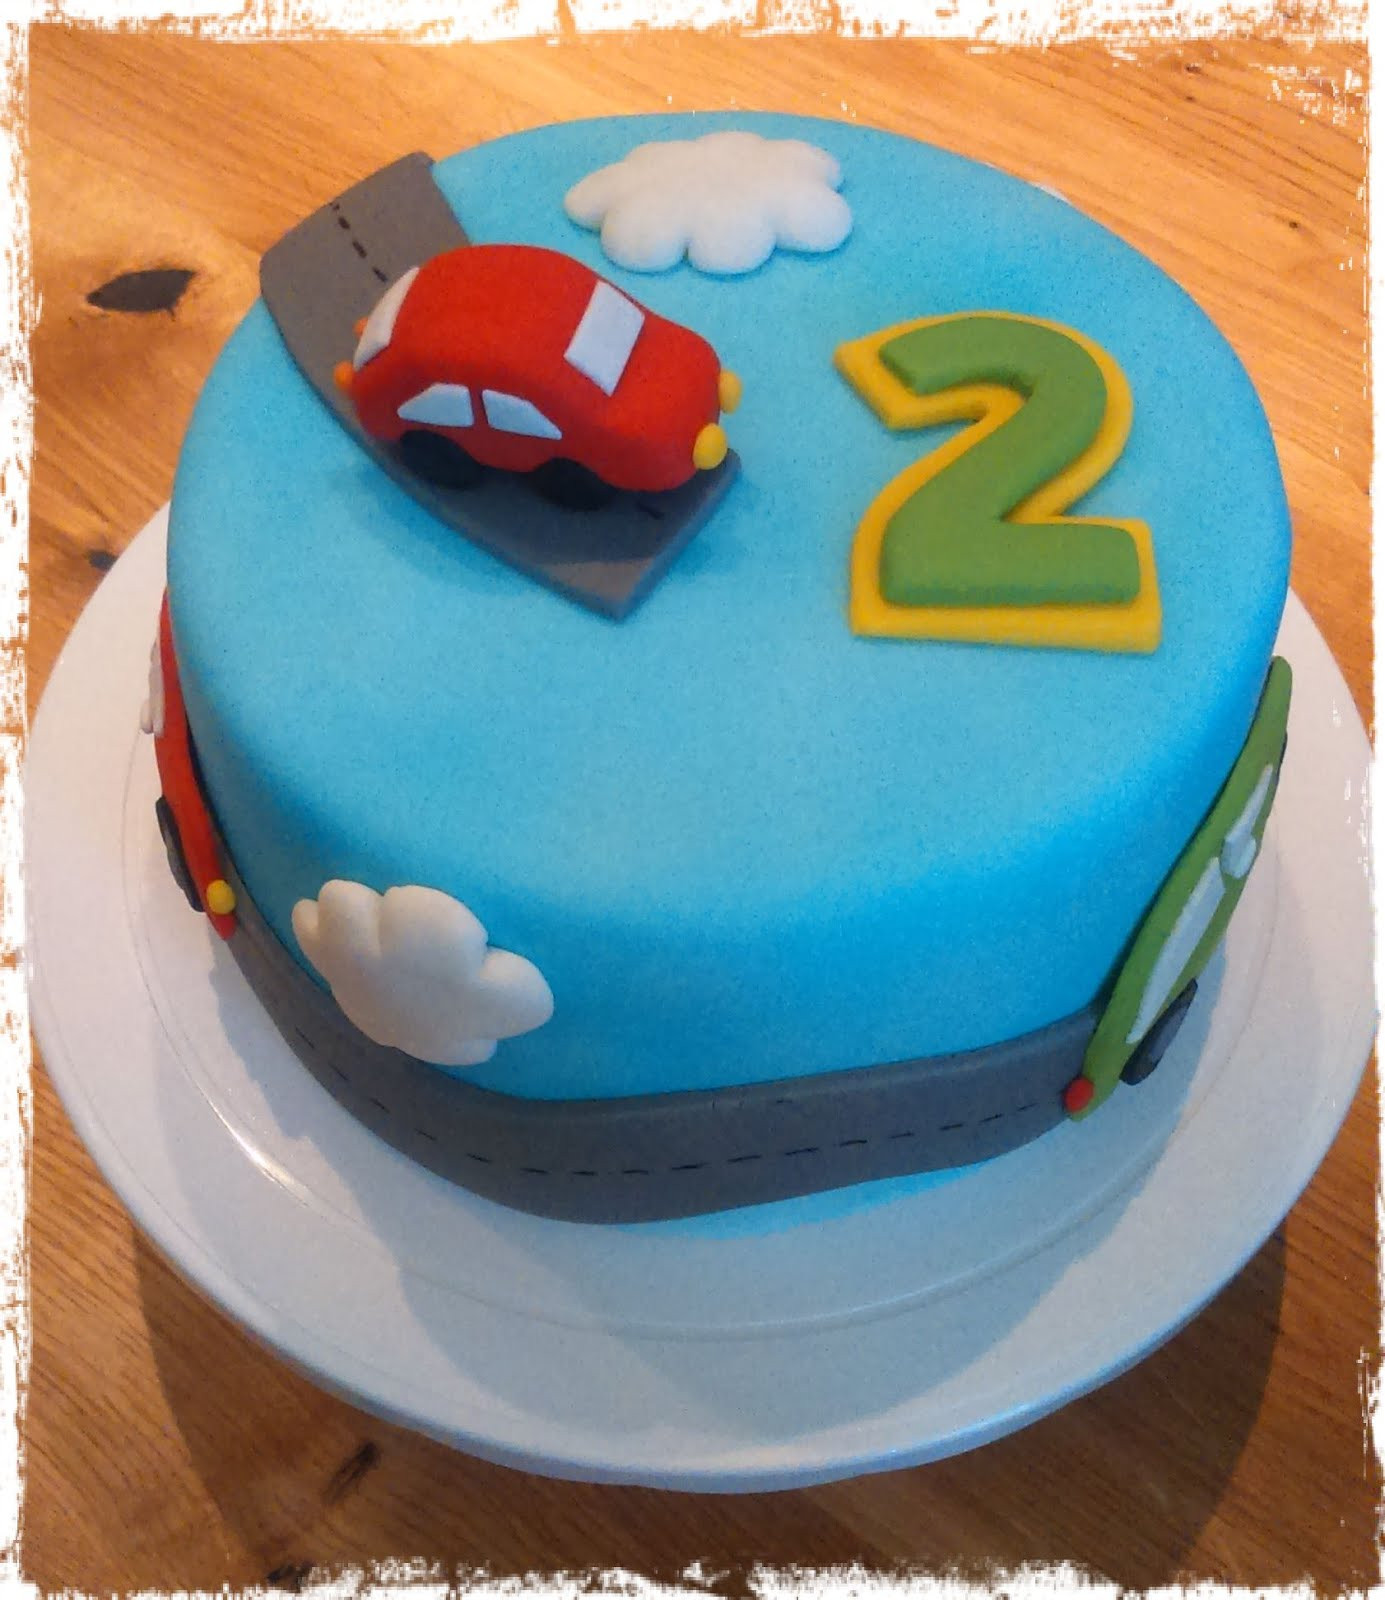 Geburtstagstorte Kinder Junge  Kaccy s Lounge Eine feine Geburtstagstorte zum 2 Geburtstag